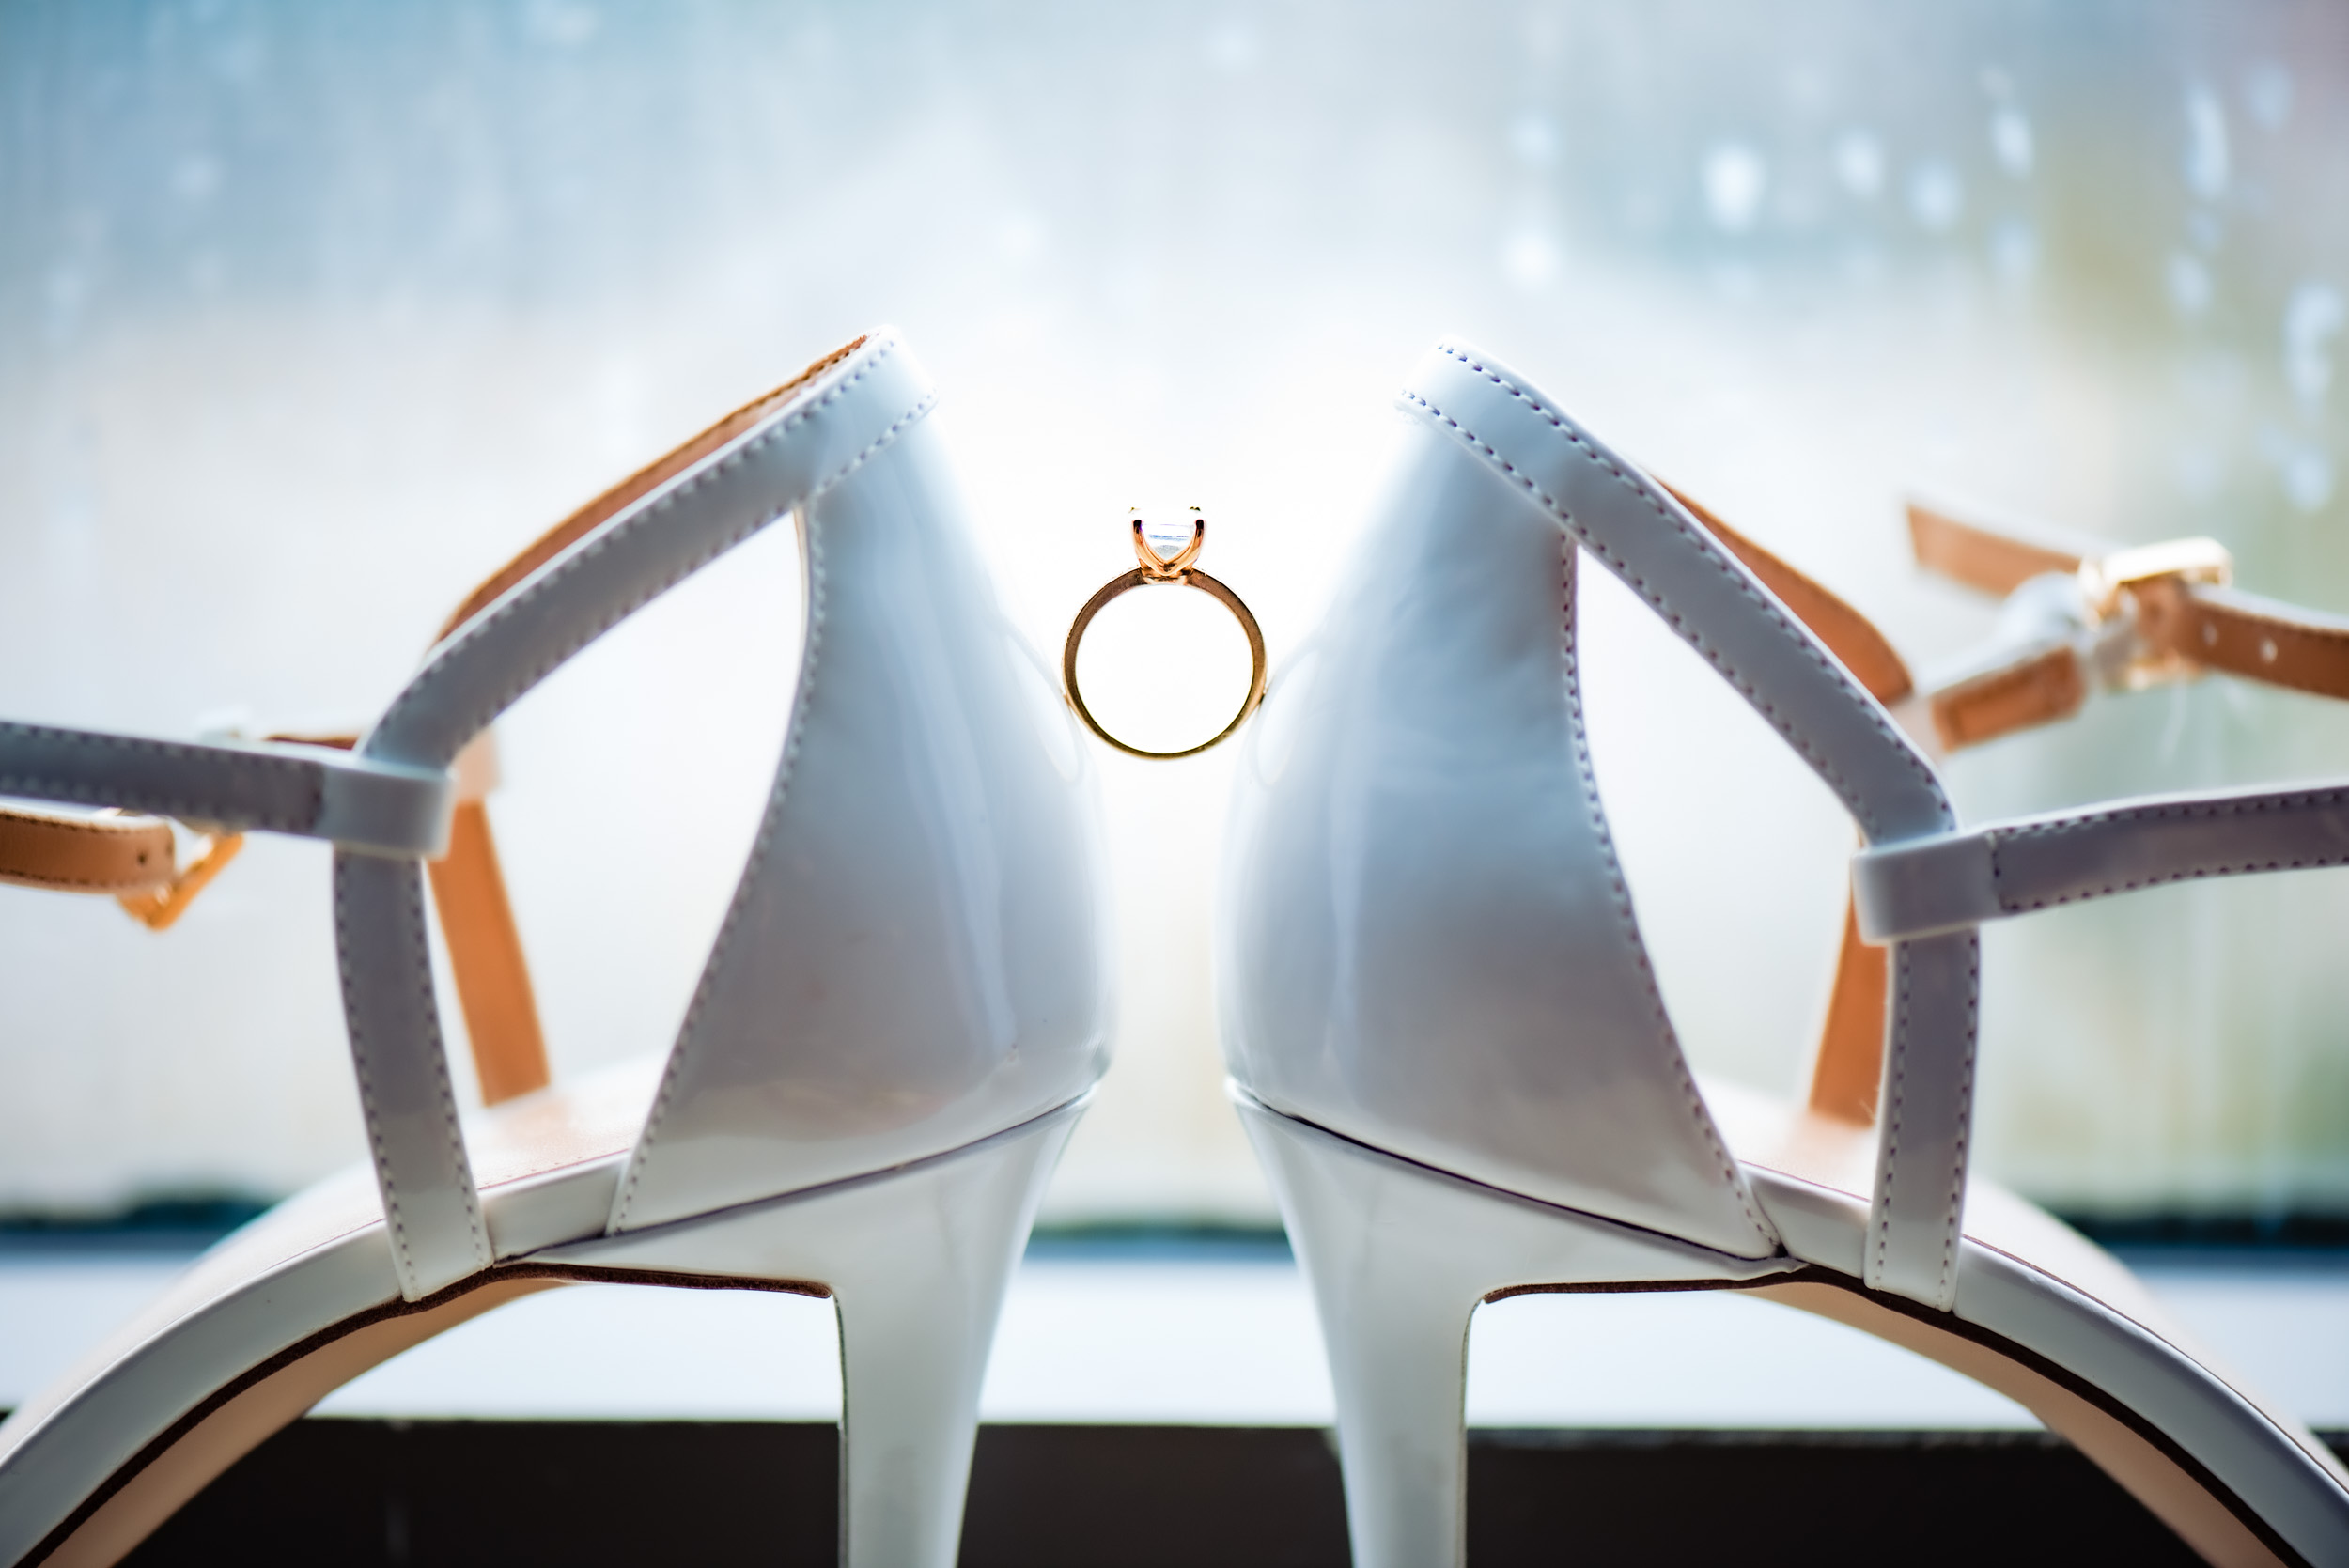 toronto-london-ontario-wedding-photographer-shoe-ring.jpg